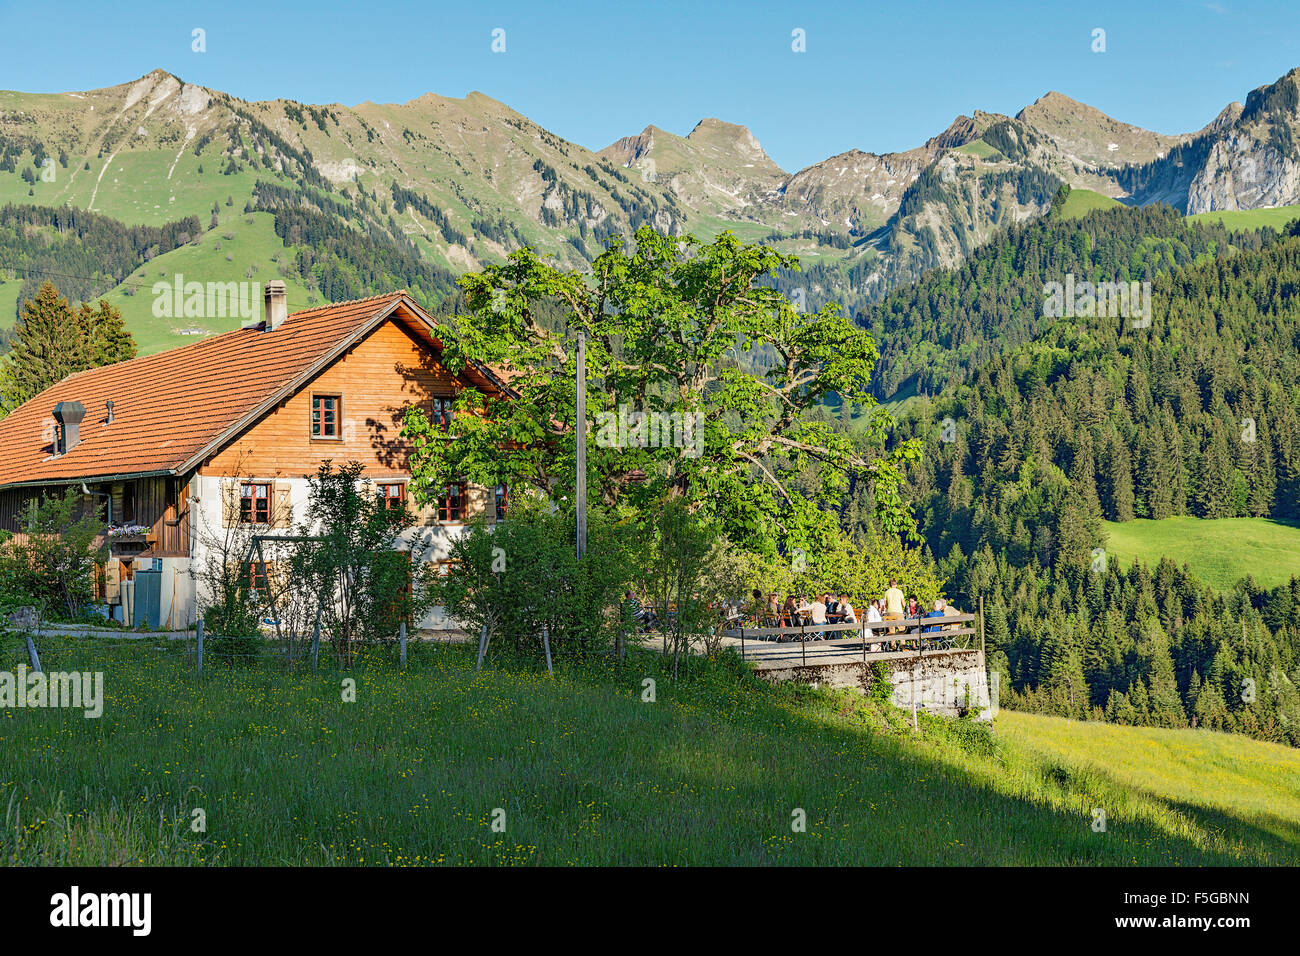 La Pinte de Mossettes is a superb restaurant in the mountains. Cerniat, Gruyère, Switzerland. Stock Photo